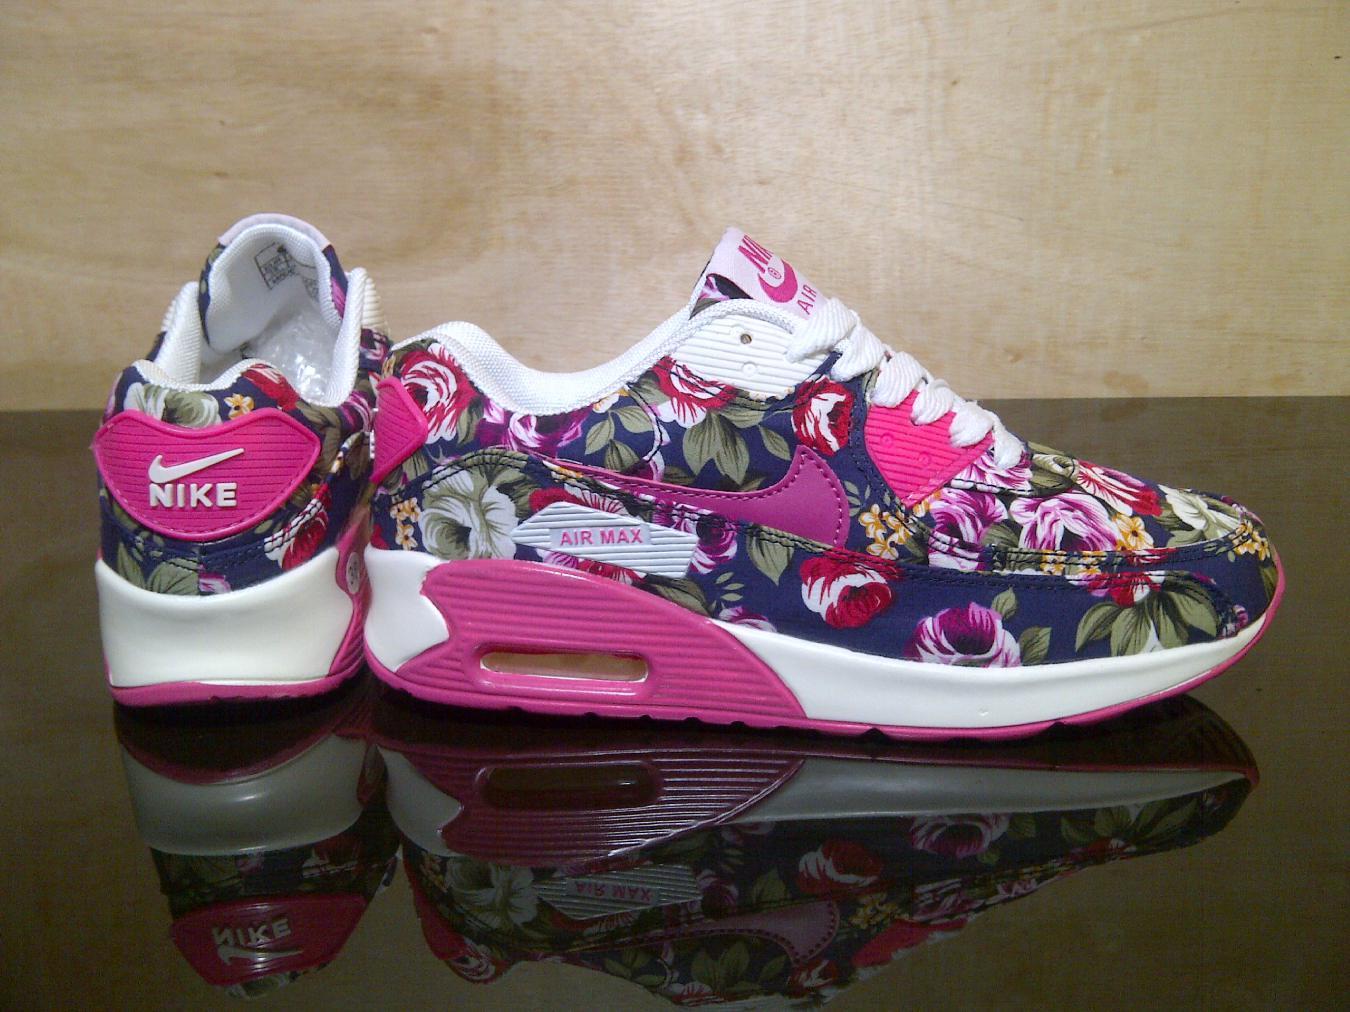 Jual sepatu sport   sepatu wanita   nike airmax 90 flower - hana shoes ... 5f3f3a91ab